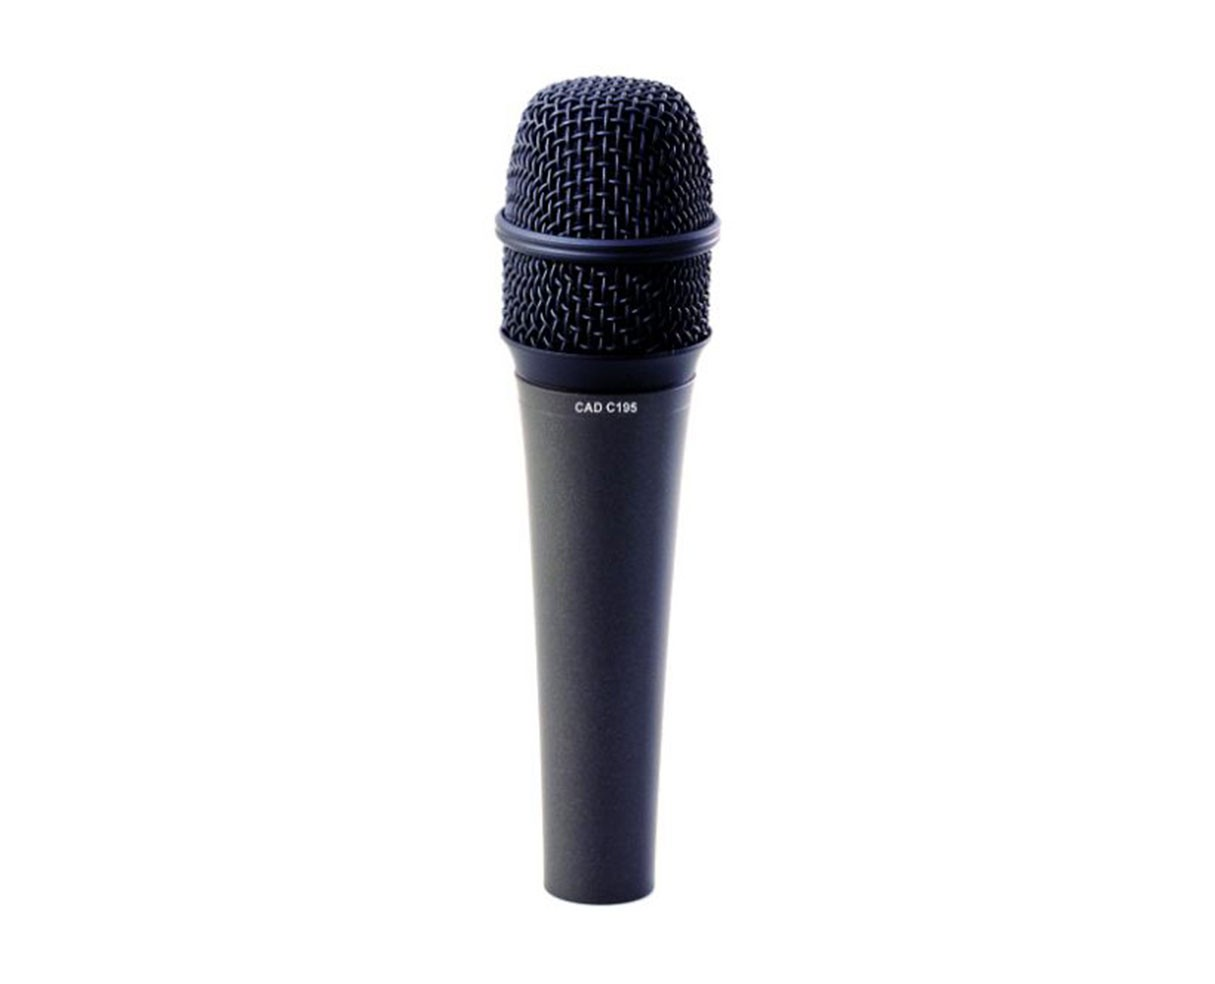 CAD C195 Handheld Vocal Condenser Microphone